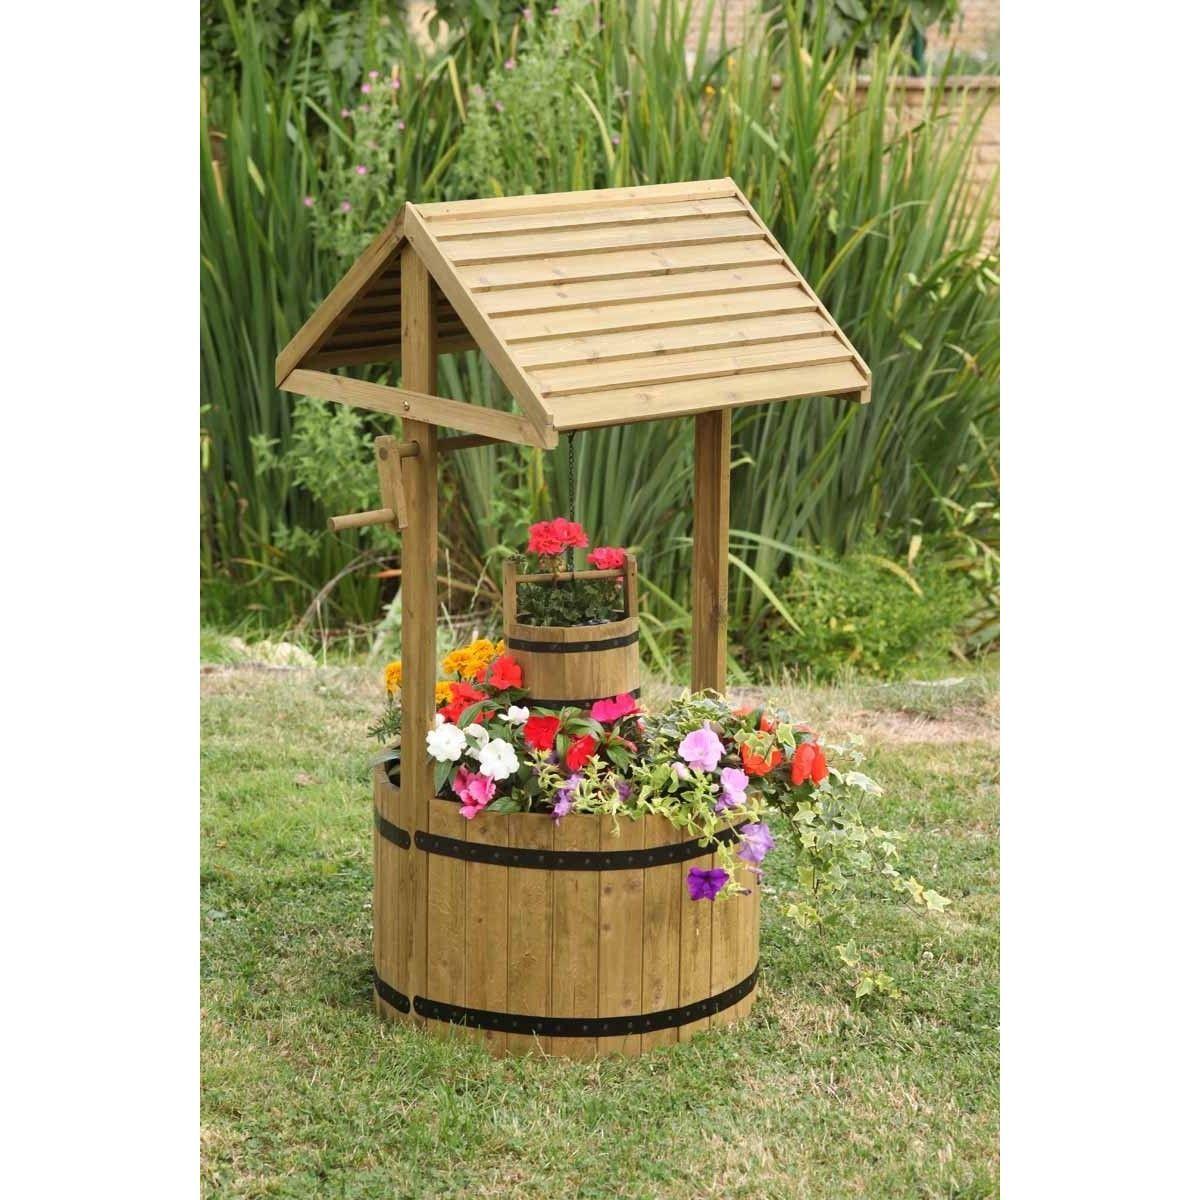 Smart Garden Wishing Well Planet Garden Planters For Sale Wishing Well Garden Smart Garden Outdoor Flowers